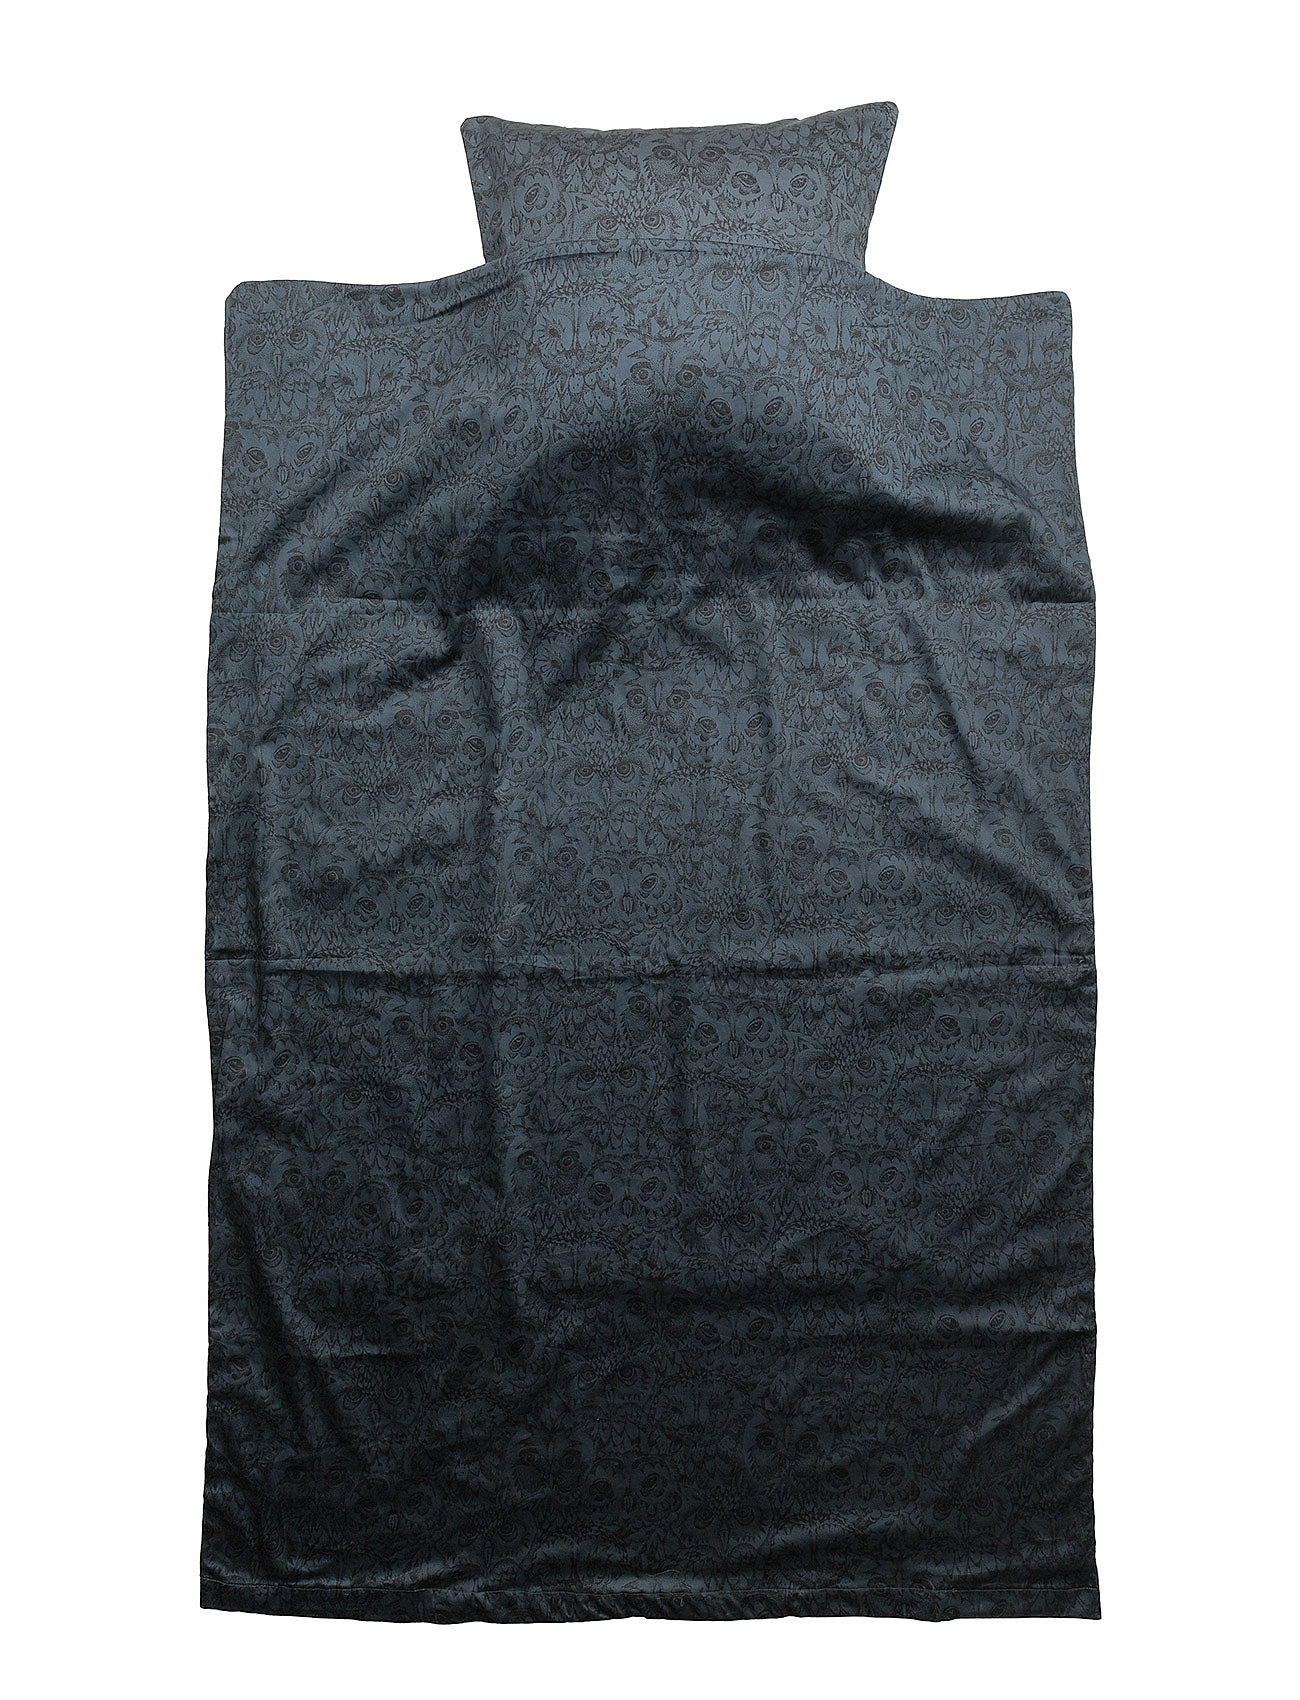 Soft Gallery Bed Linen Junior - ORION BLUE, AOP OWL